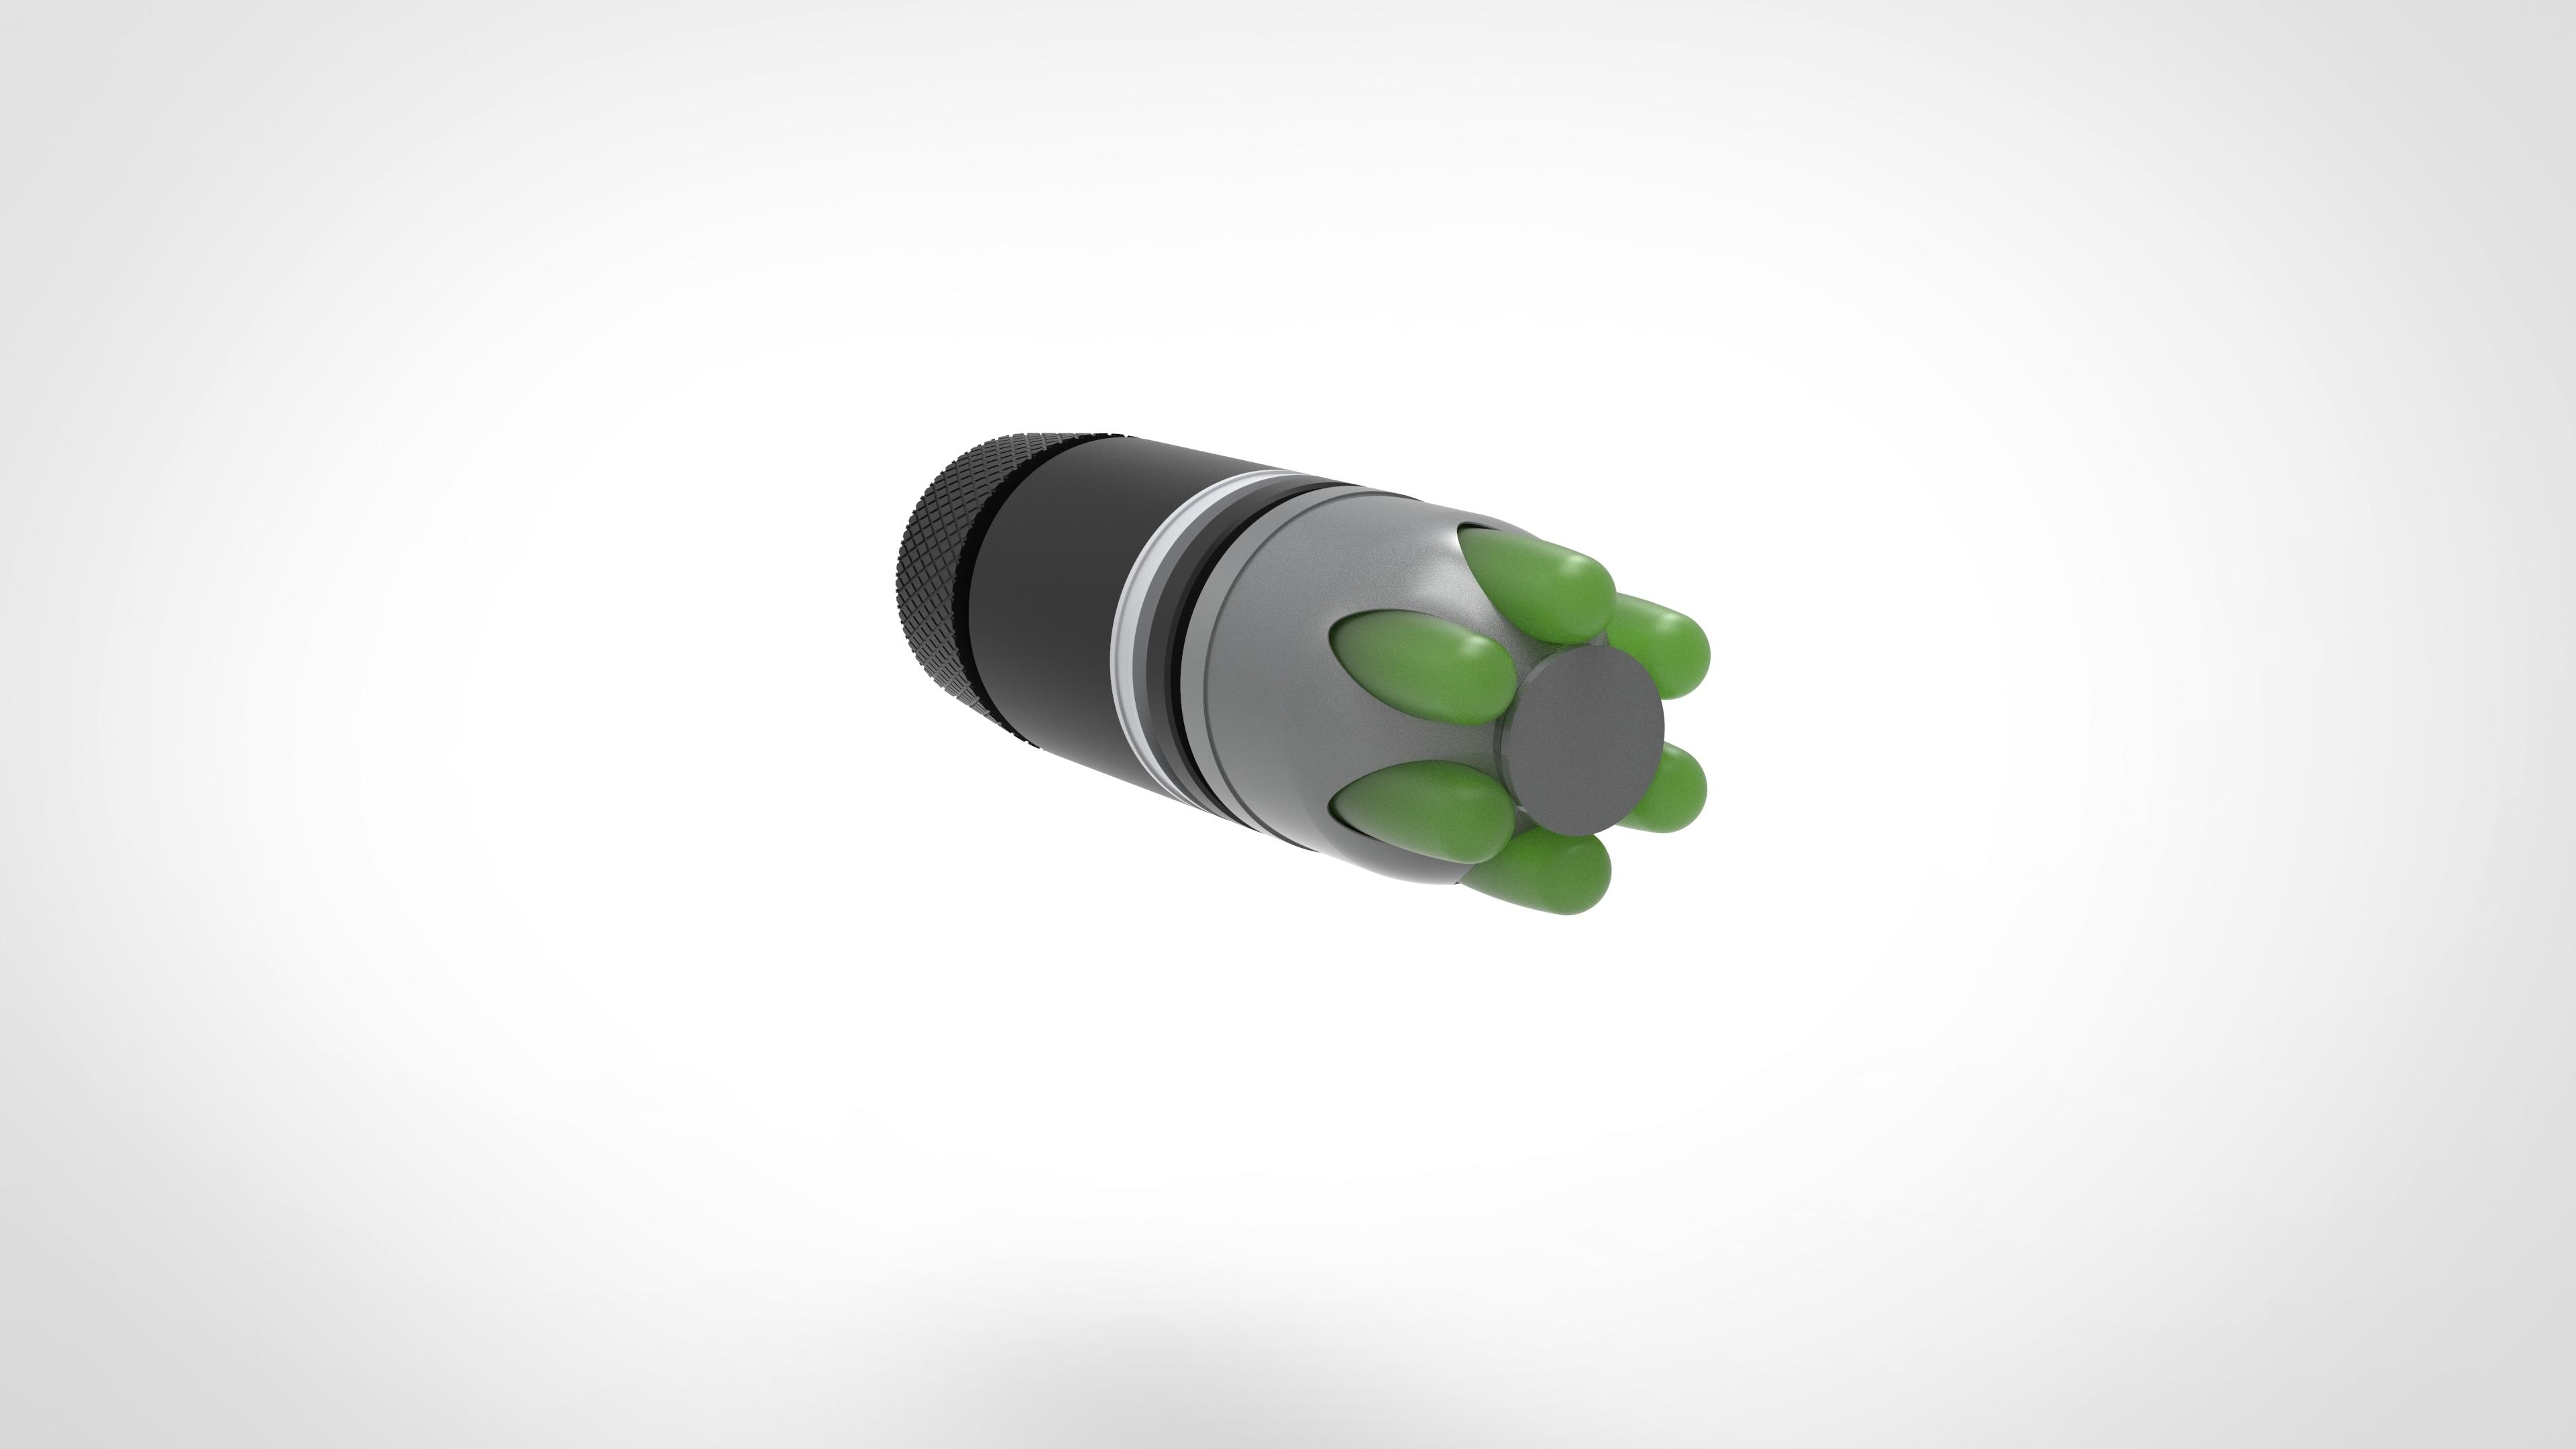 002.jpg Download 3MF file Glue grenade from the video game Batman: Arkham Origins • 3D printer model, vetrock